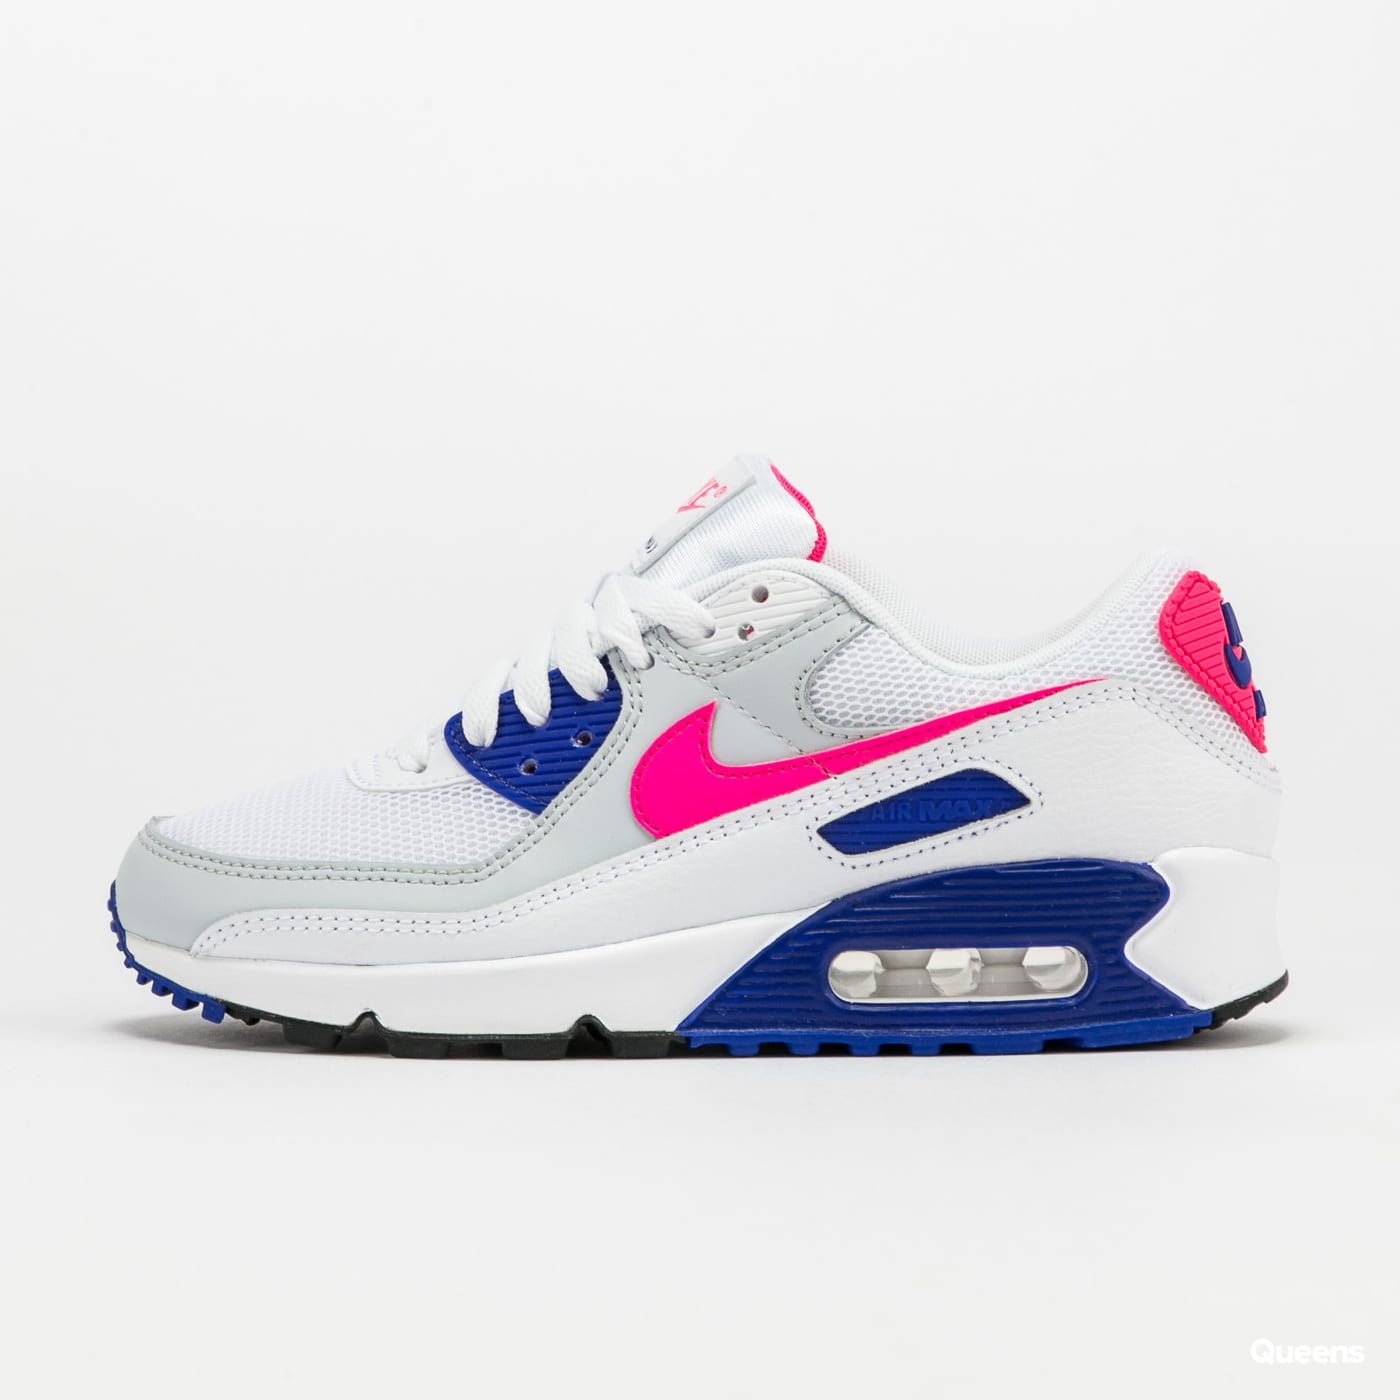 Nike WMNS Air Max 90 white / hyper pink - concord